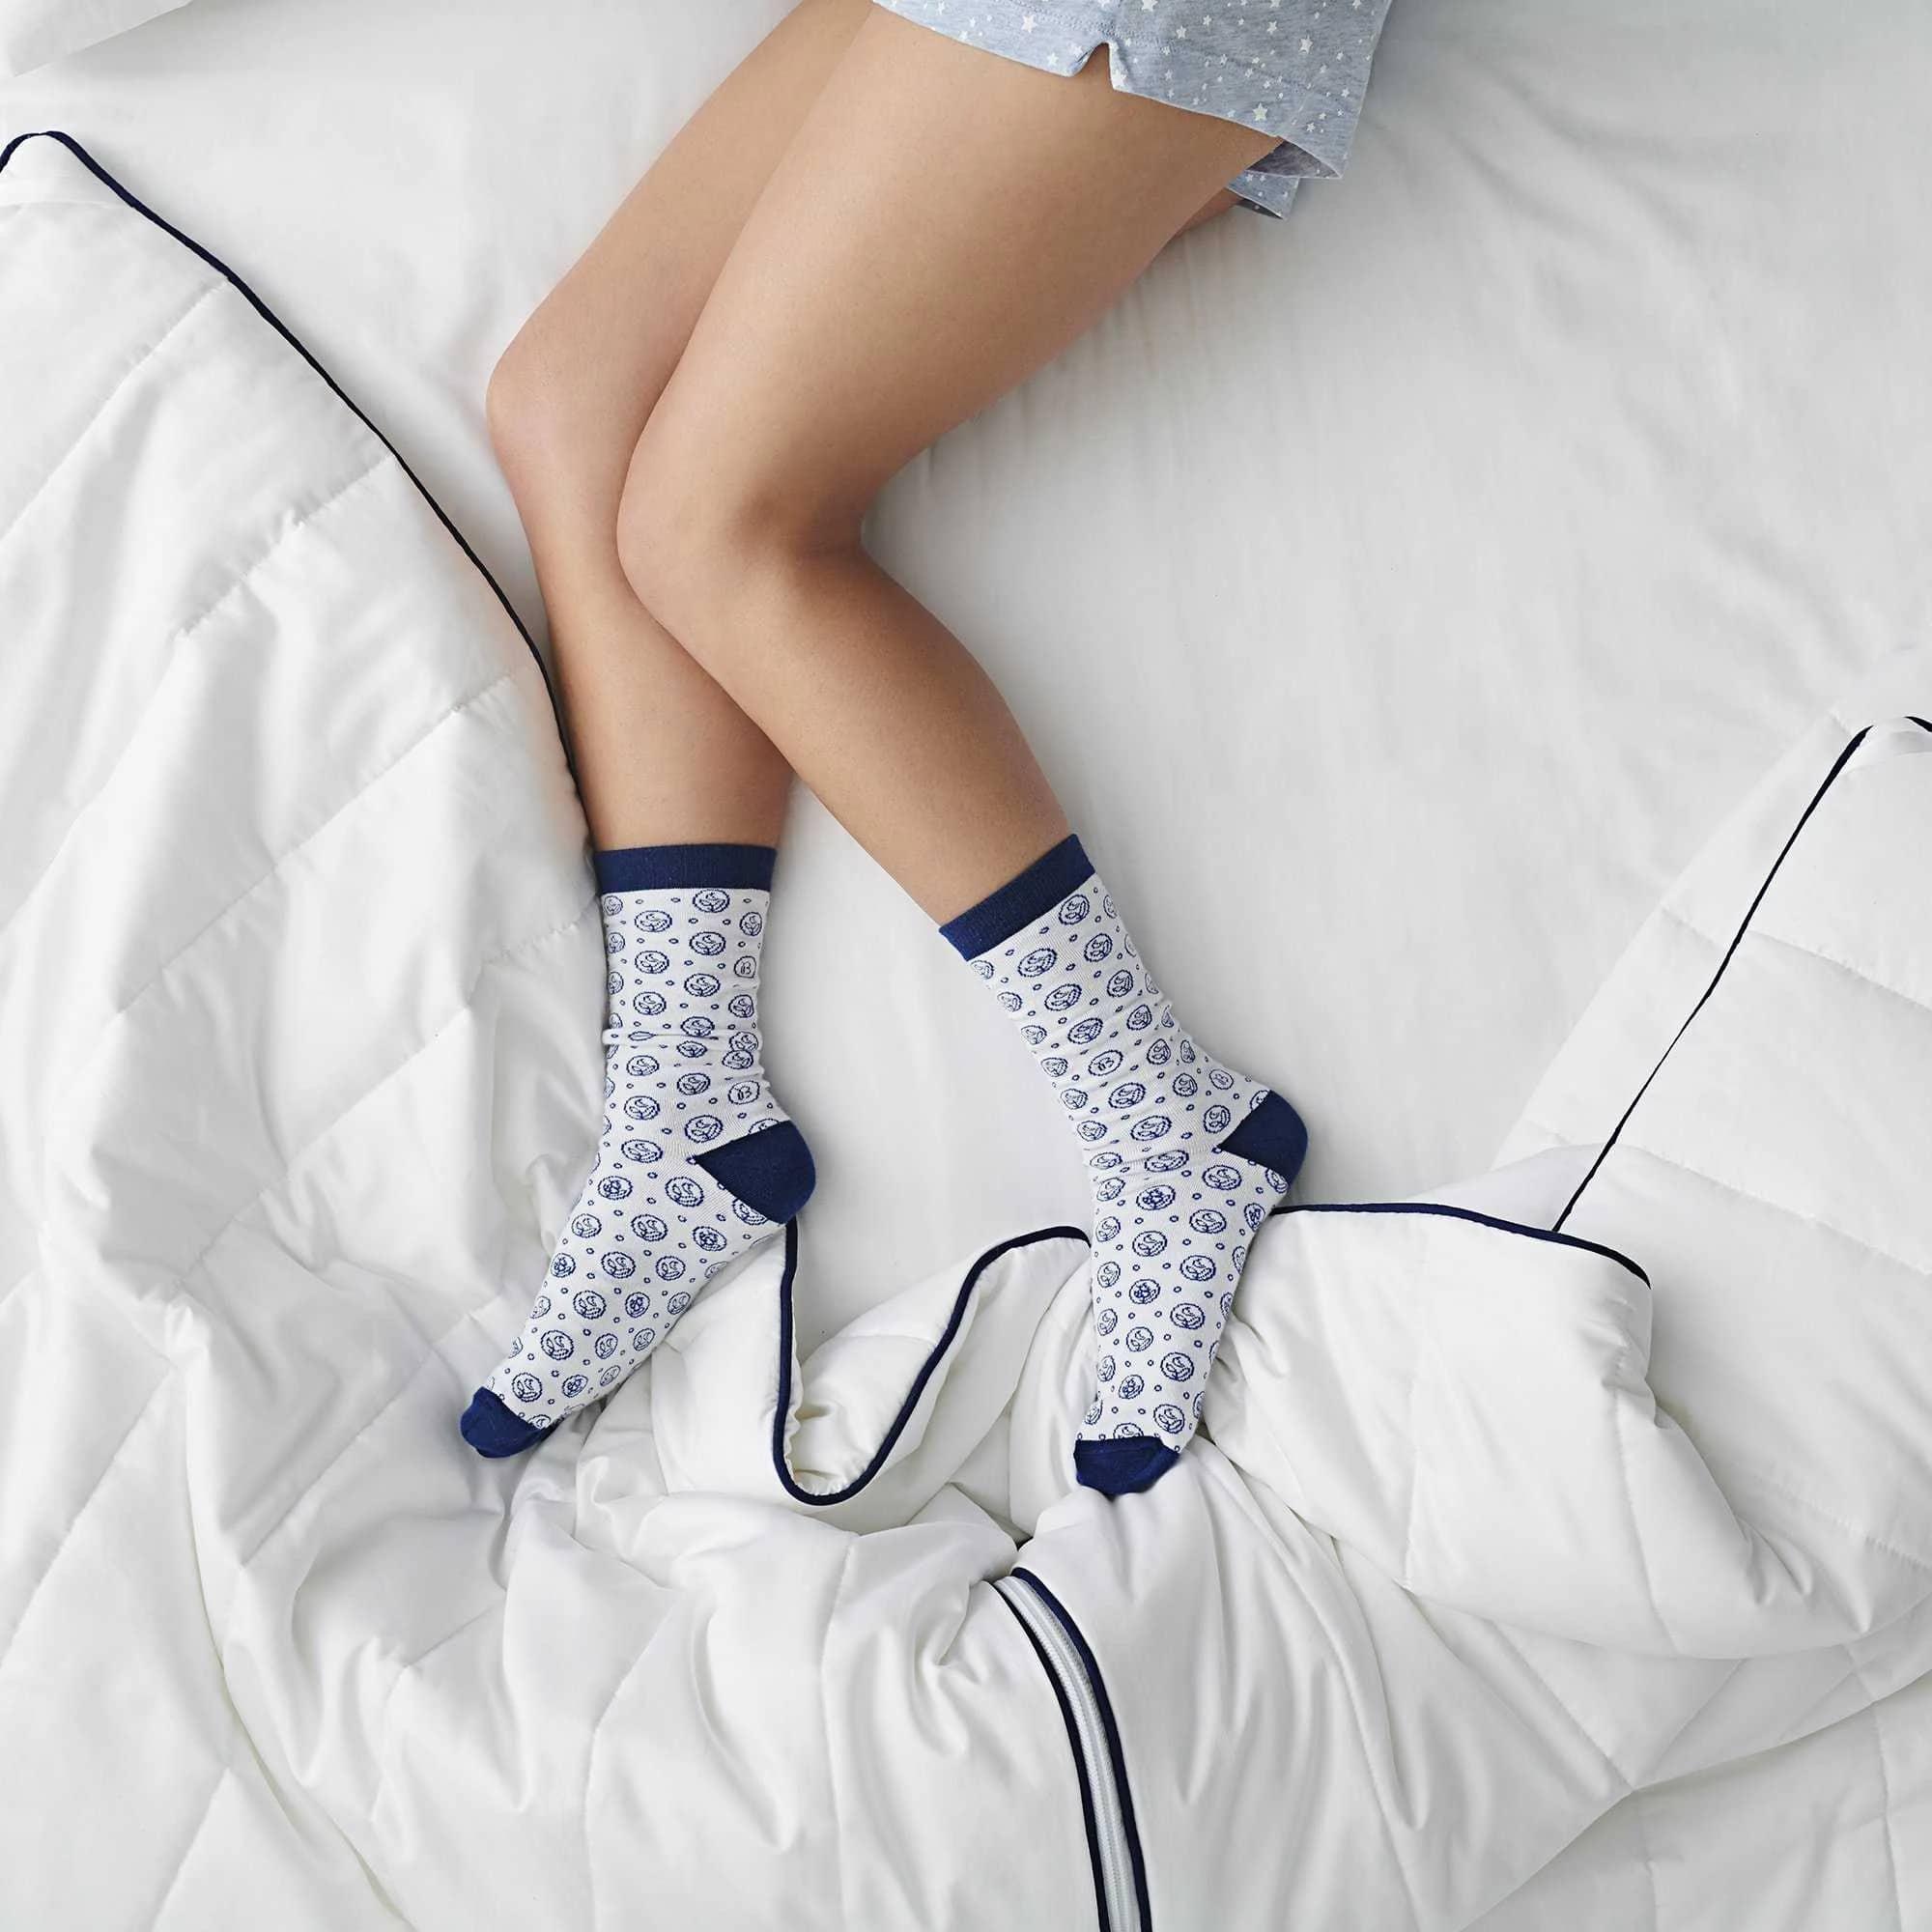 restless leg syndrome helpful tips